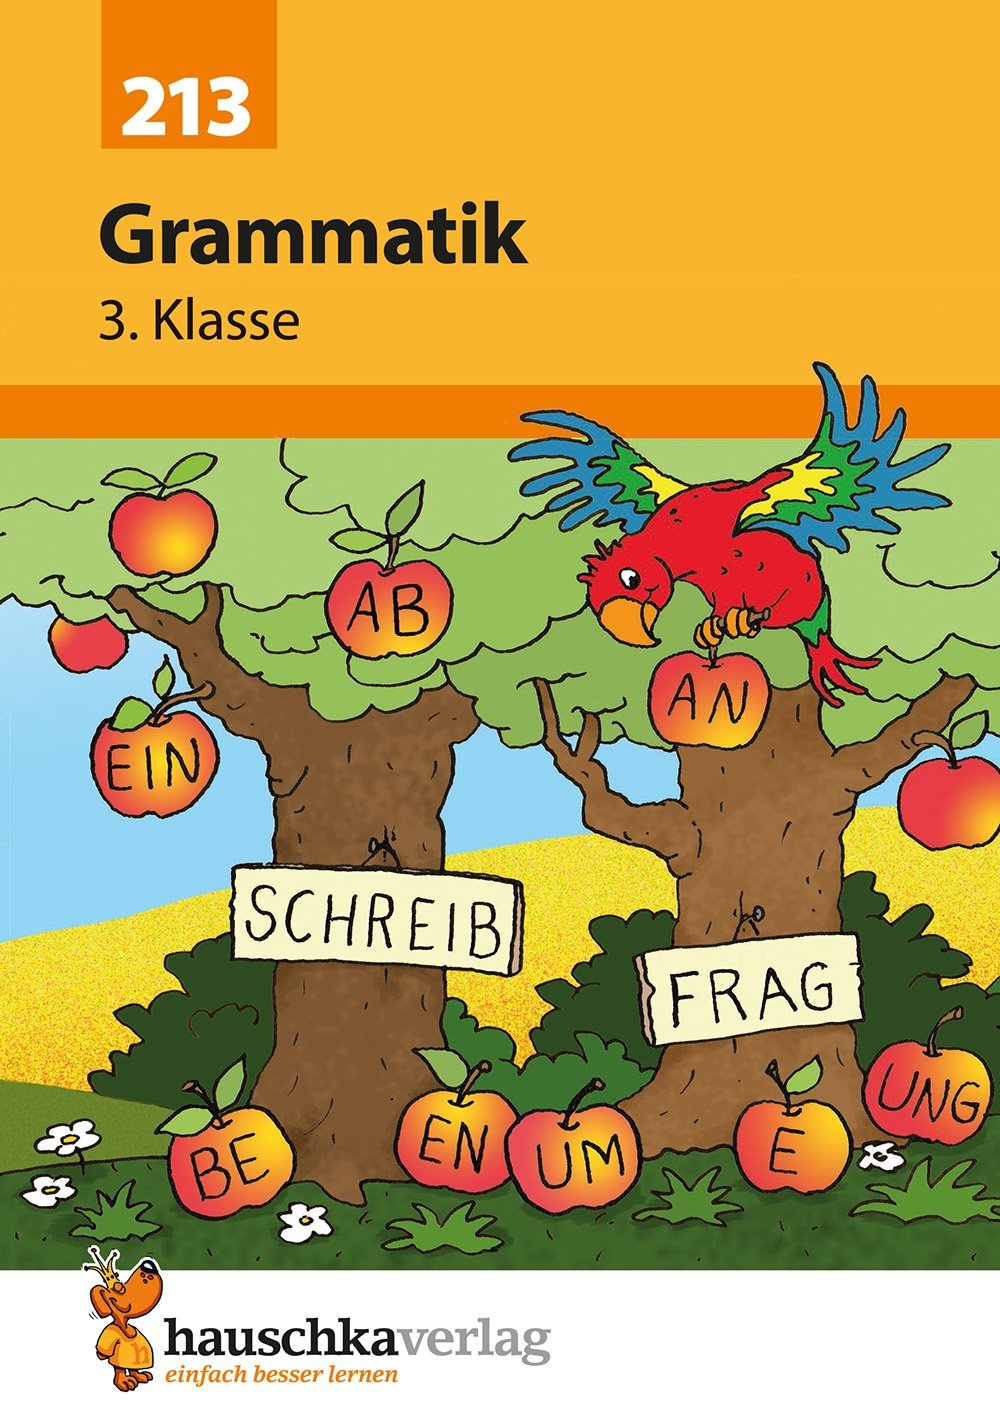 Grammatik 3. Klasse  Deutsch  Grammatik Band 213